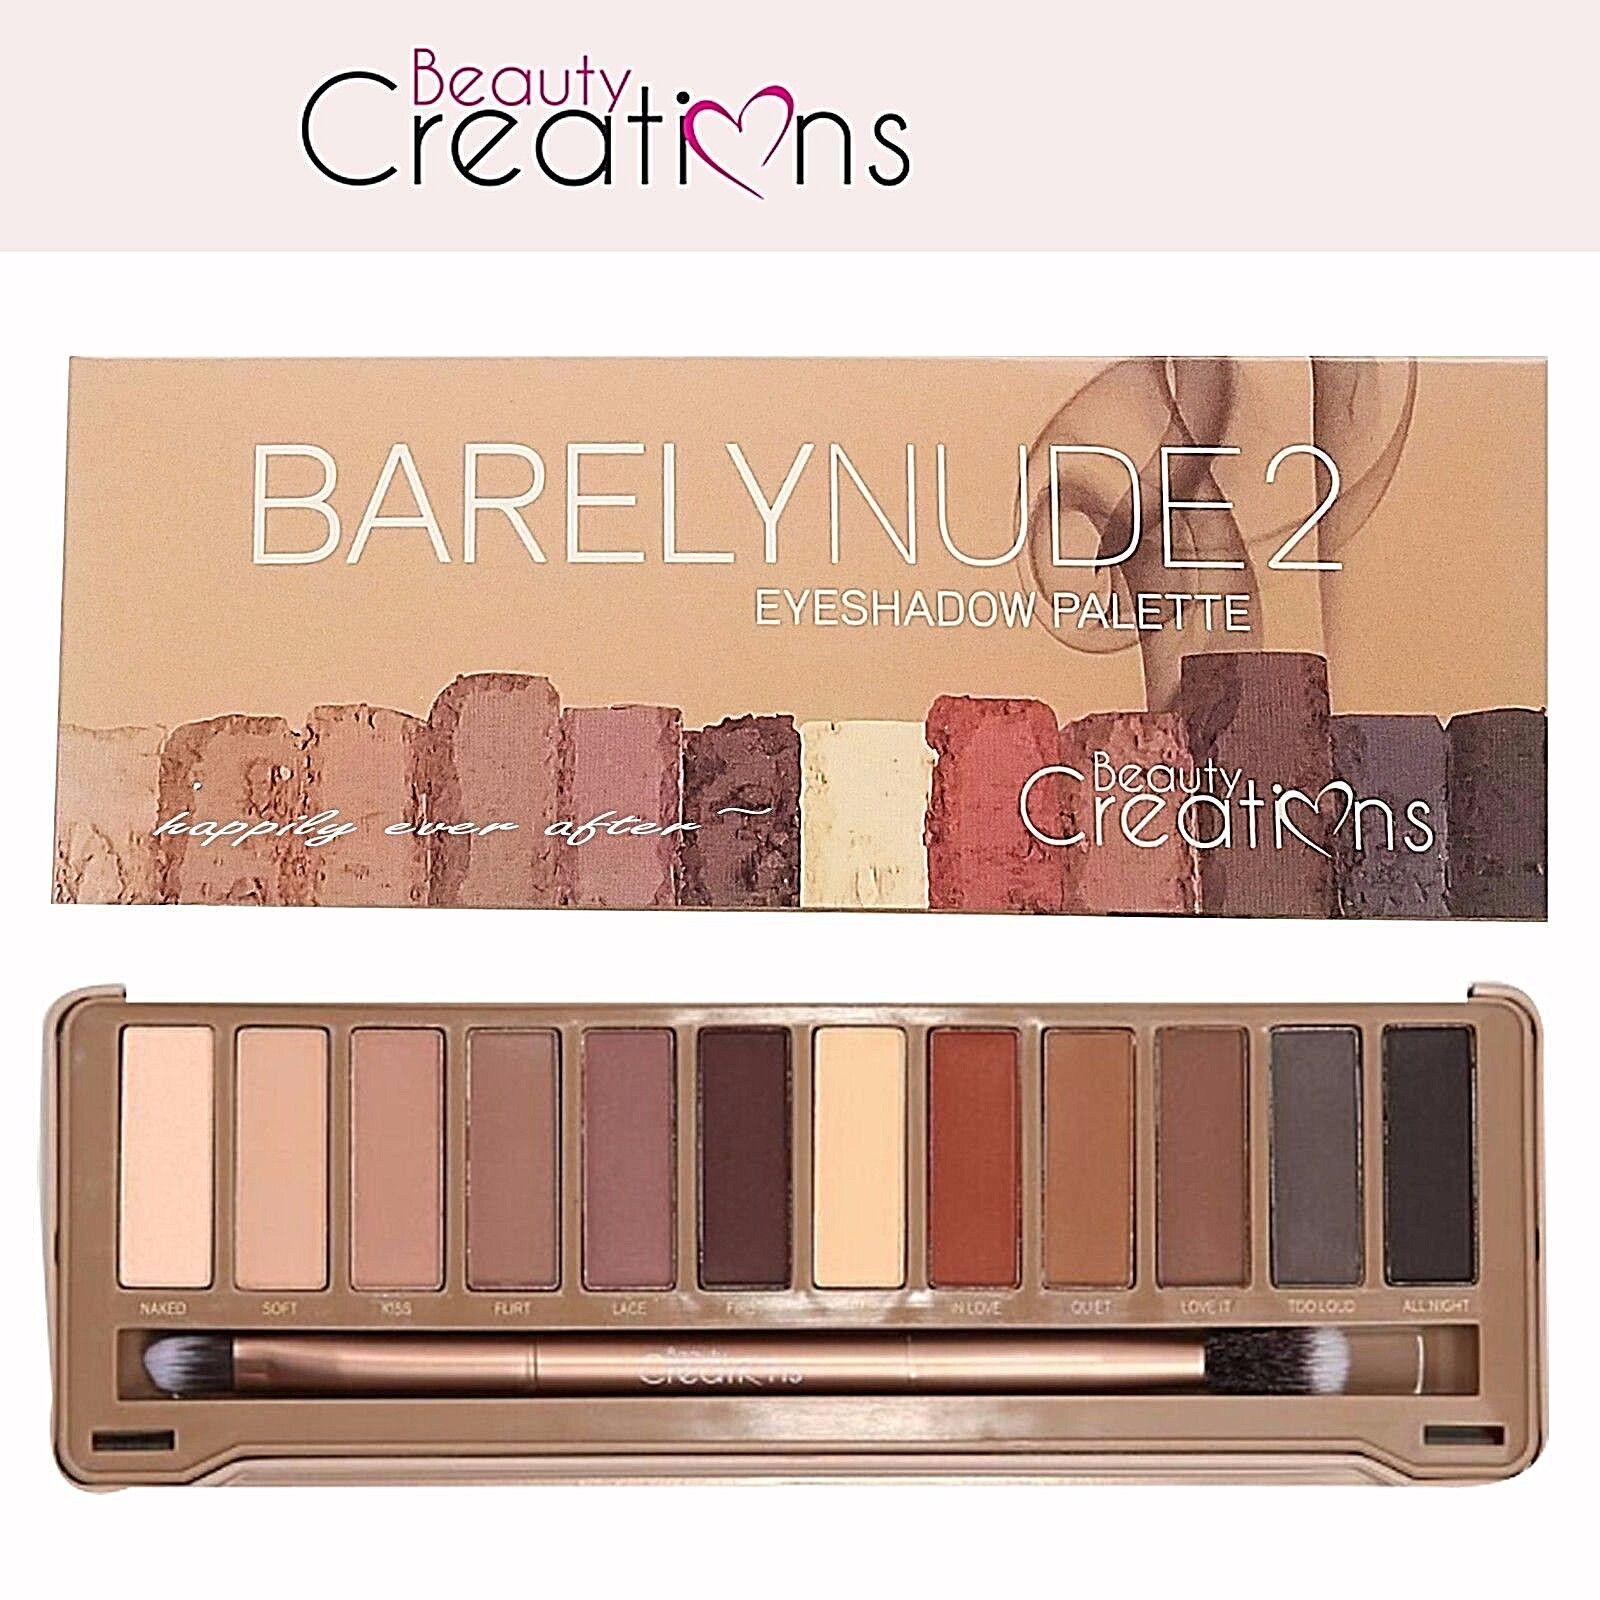 Ebay Neutral Eye Shadow Palette Beauty Creations Barely Nude 2 Tease Me Eyeshadow